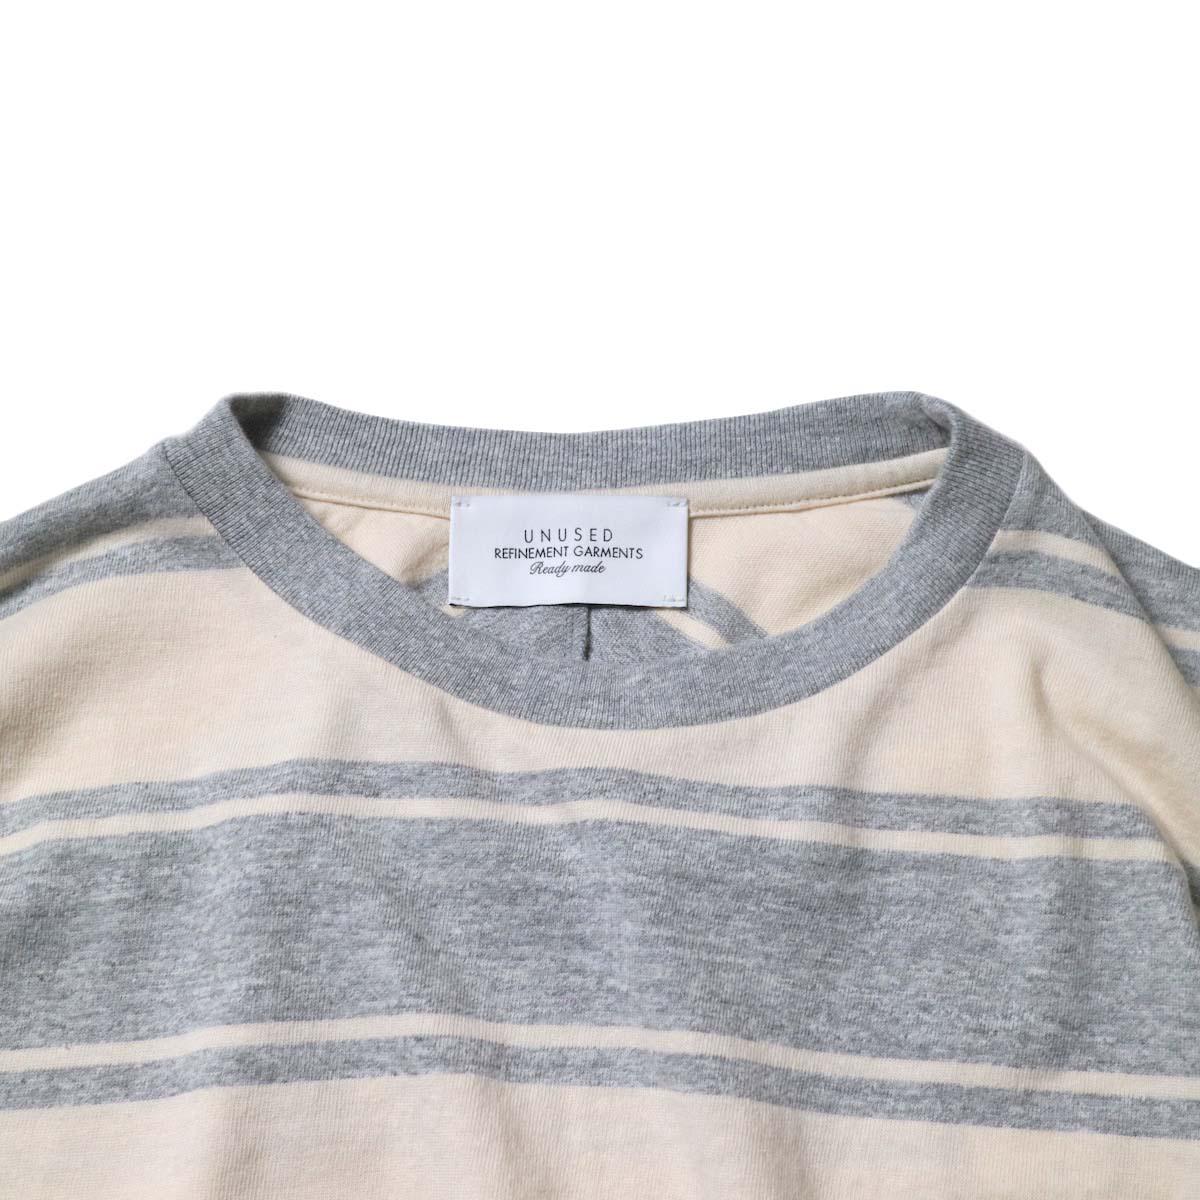 UNUSED / US1951 Dolman sleeve Short sleeve t-shirt (Gray × Beige)ネック